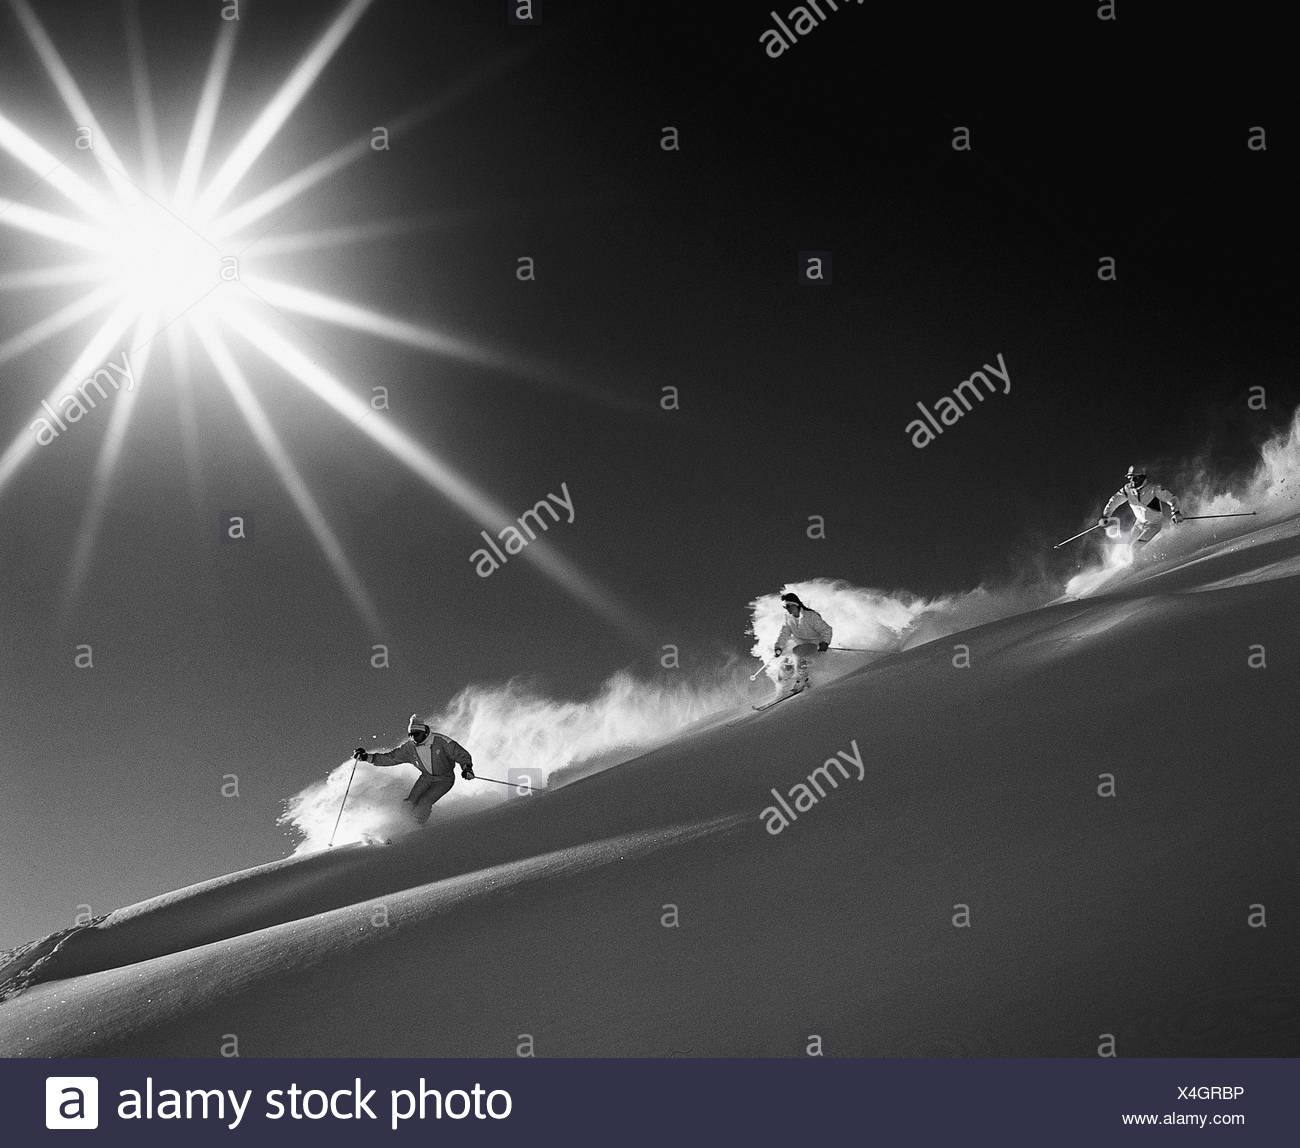 Montagnes groupe ski neige monochrome noir et blanc sun sport ski ski neige profonde neige profonde dri Photo Stock